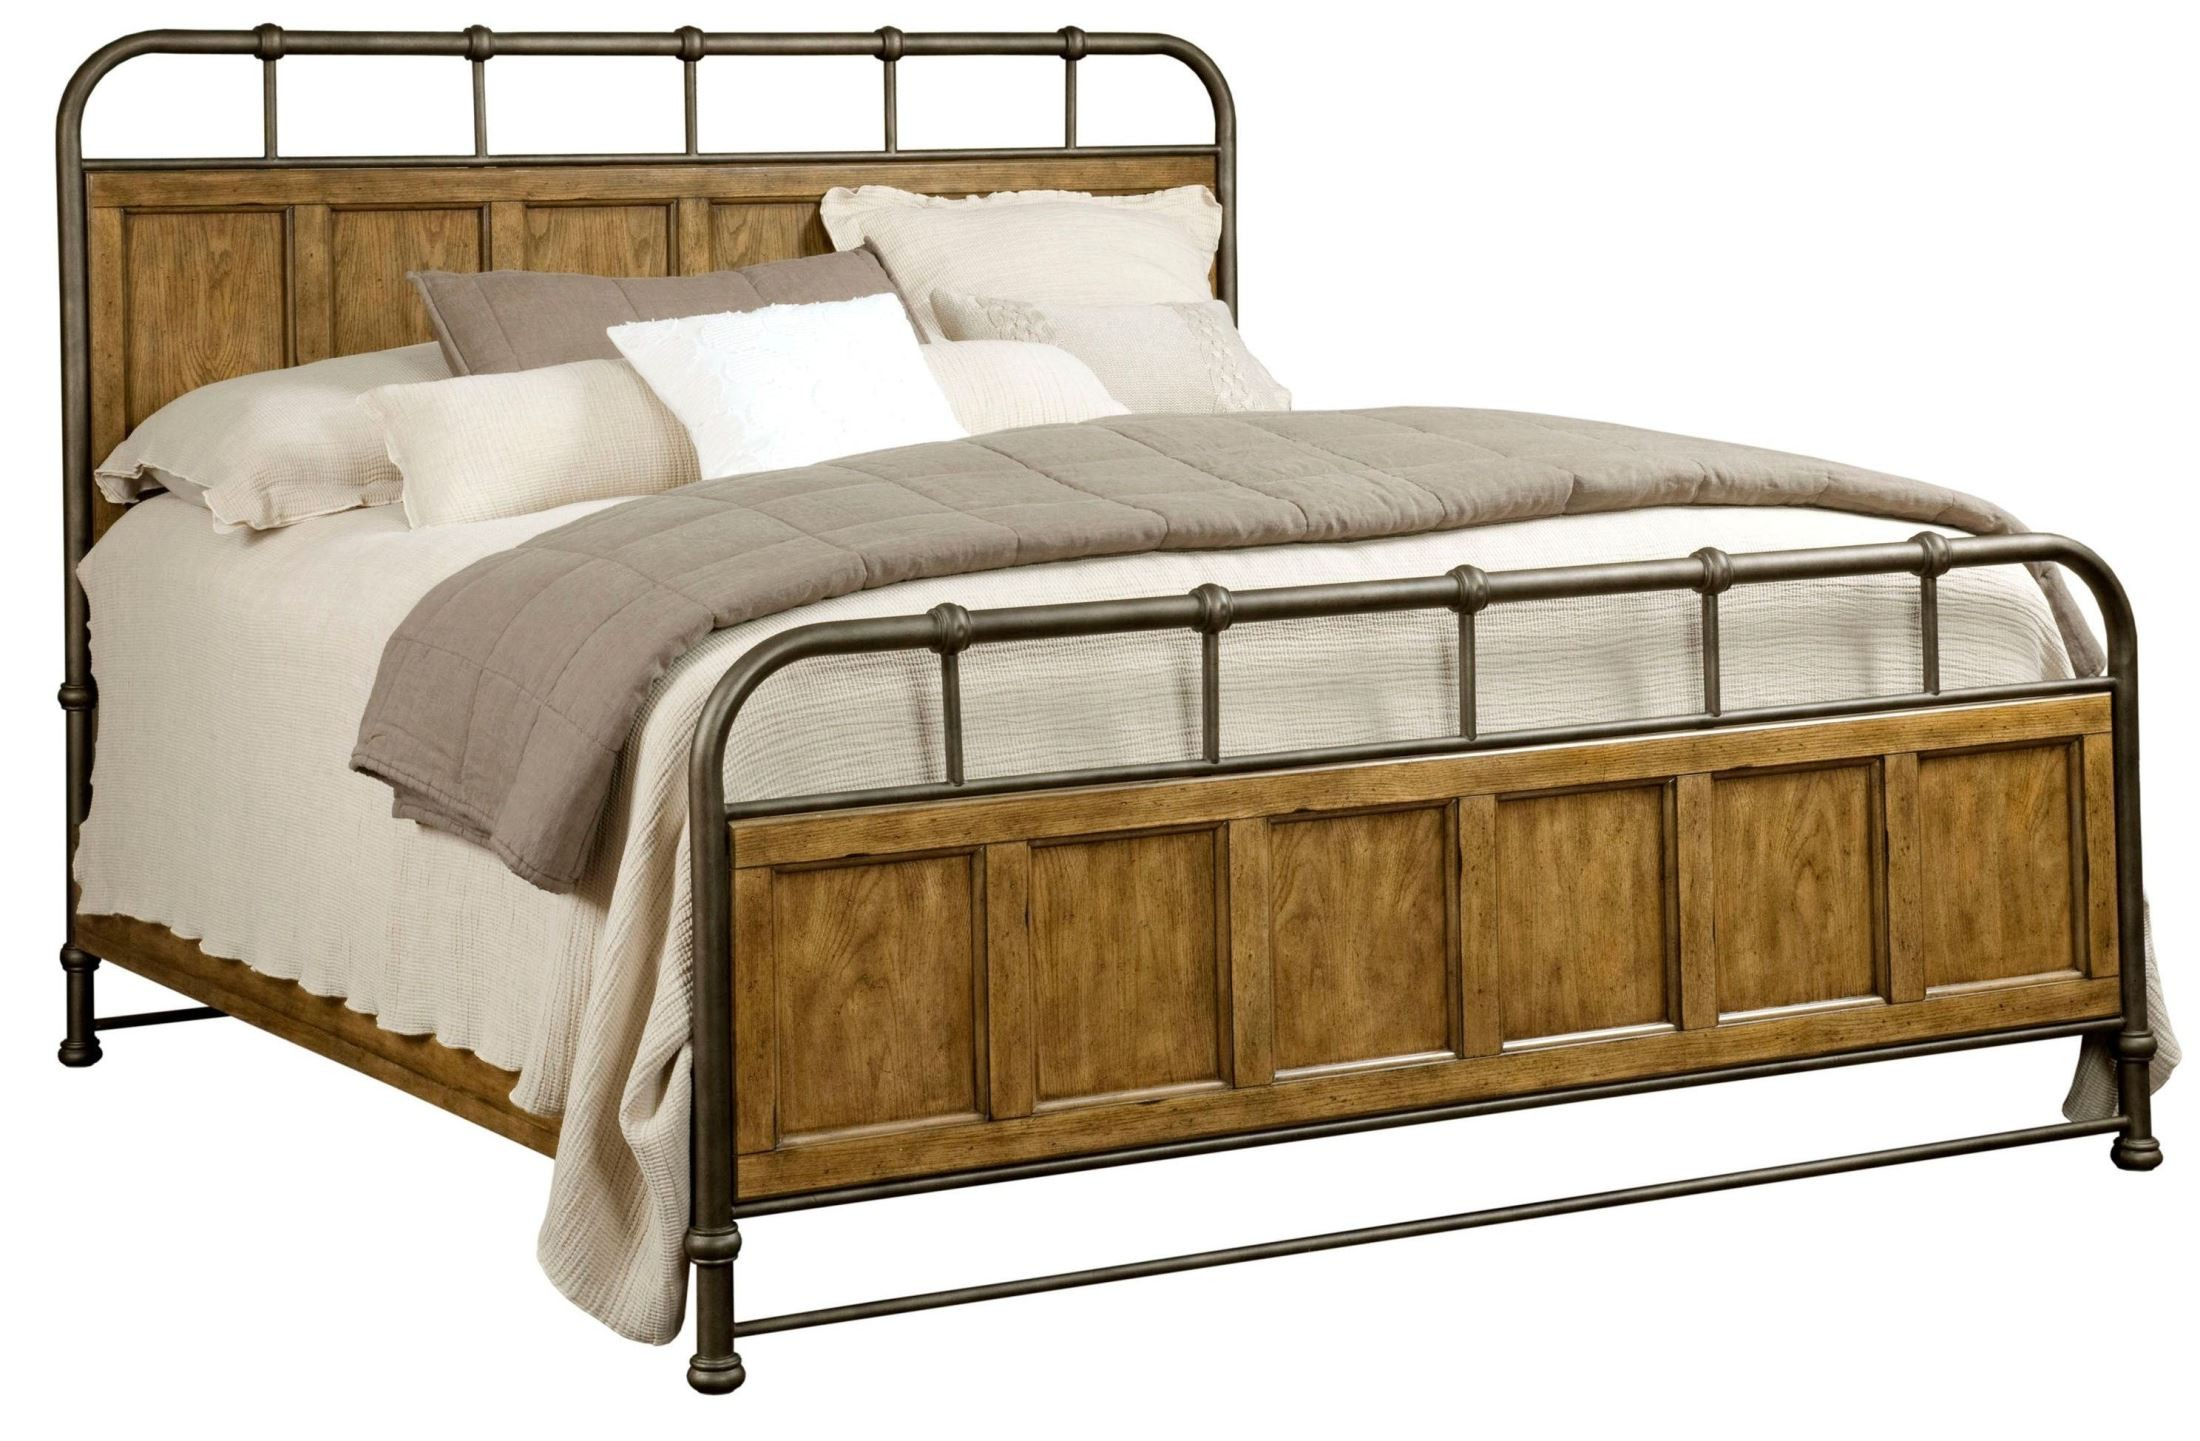 new vintage brown king metal wood bedstead bed from broyhill 4808 252 253 455 coleman furniture. Black Bedroom Furniture Sets. Home Design Ideas